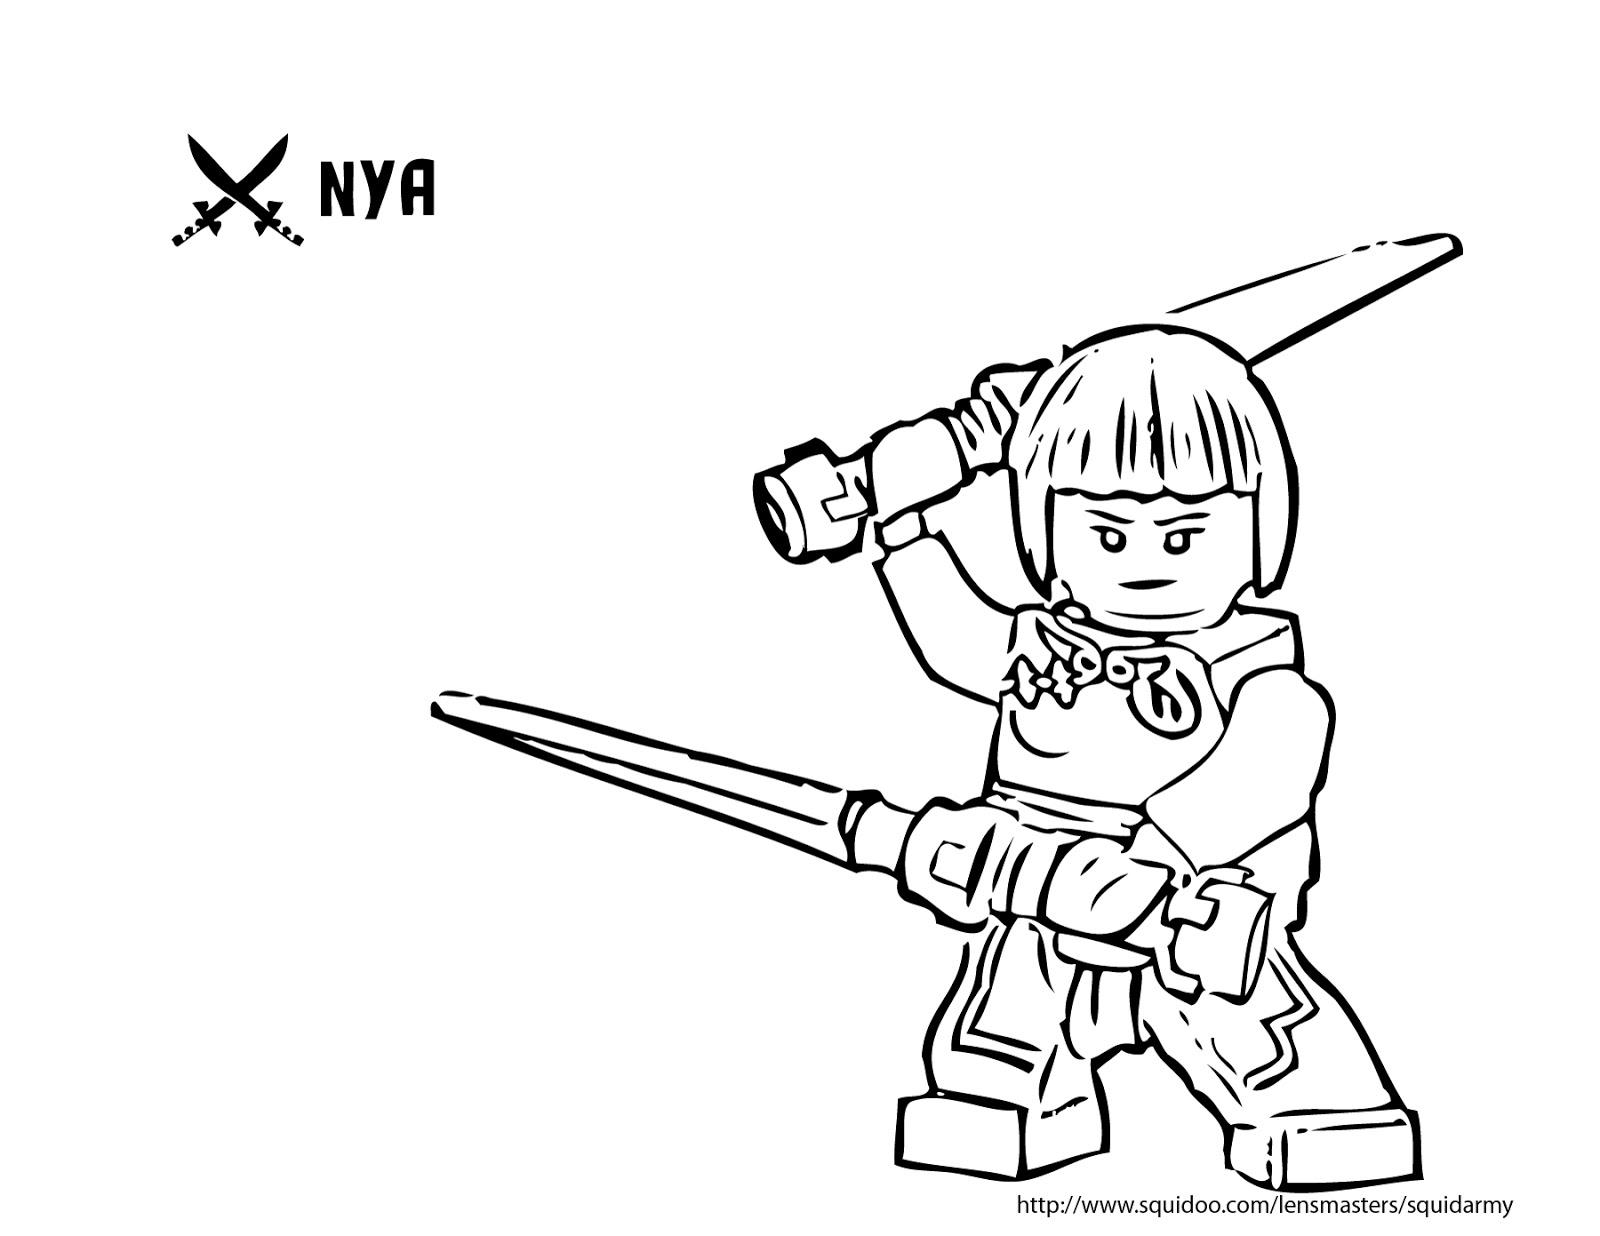 √ lego ninjago grner ninja ausmalbilder ausmalbilder webpage